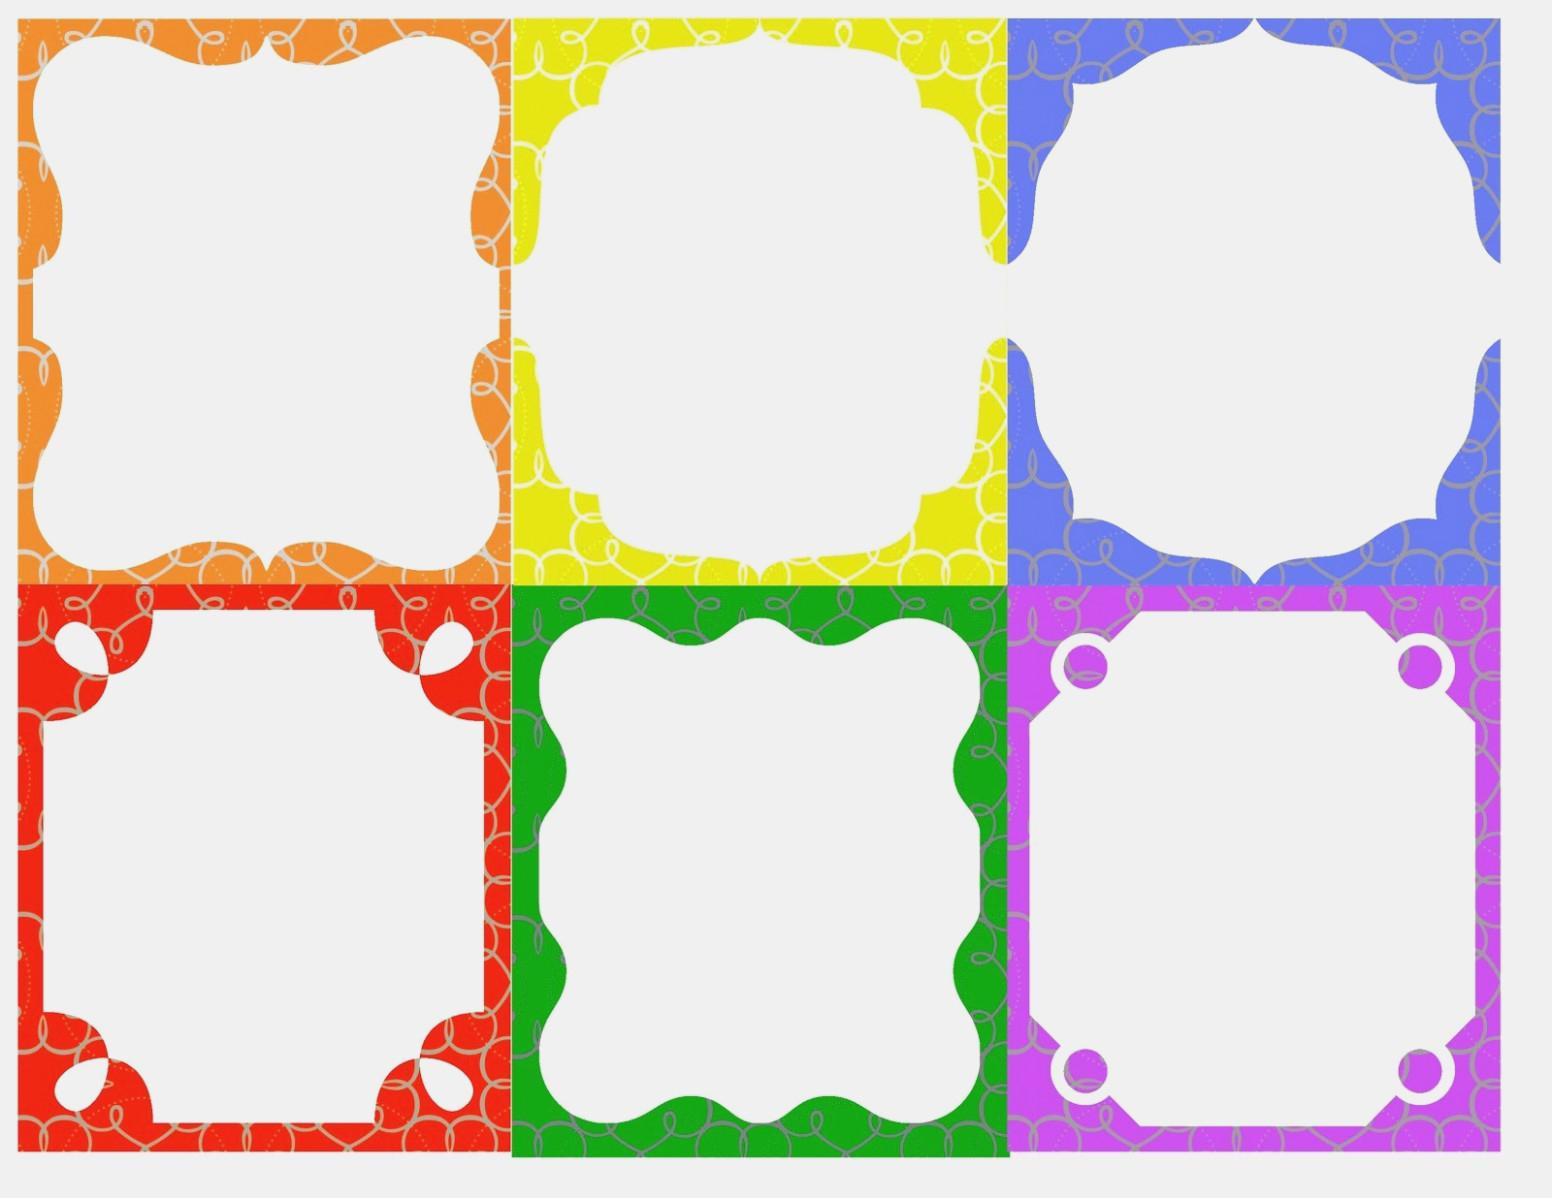 Free Printable Name Tags Template – Hola.klonec – Label Maker Ideas - Free Printable Name Tags